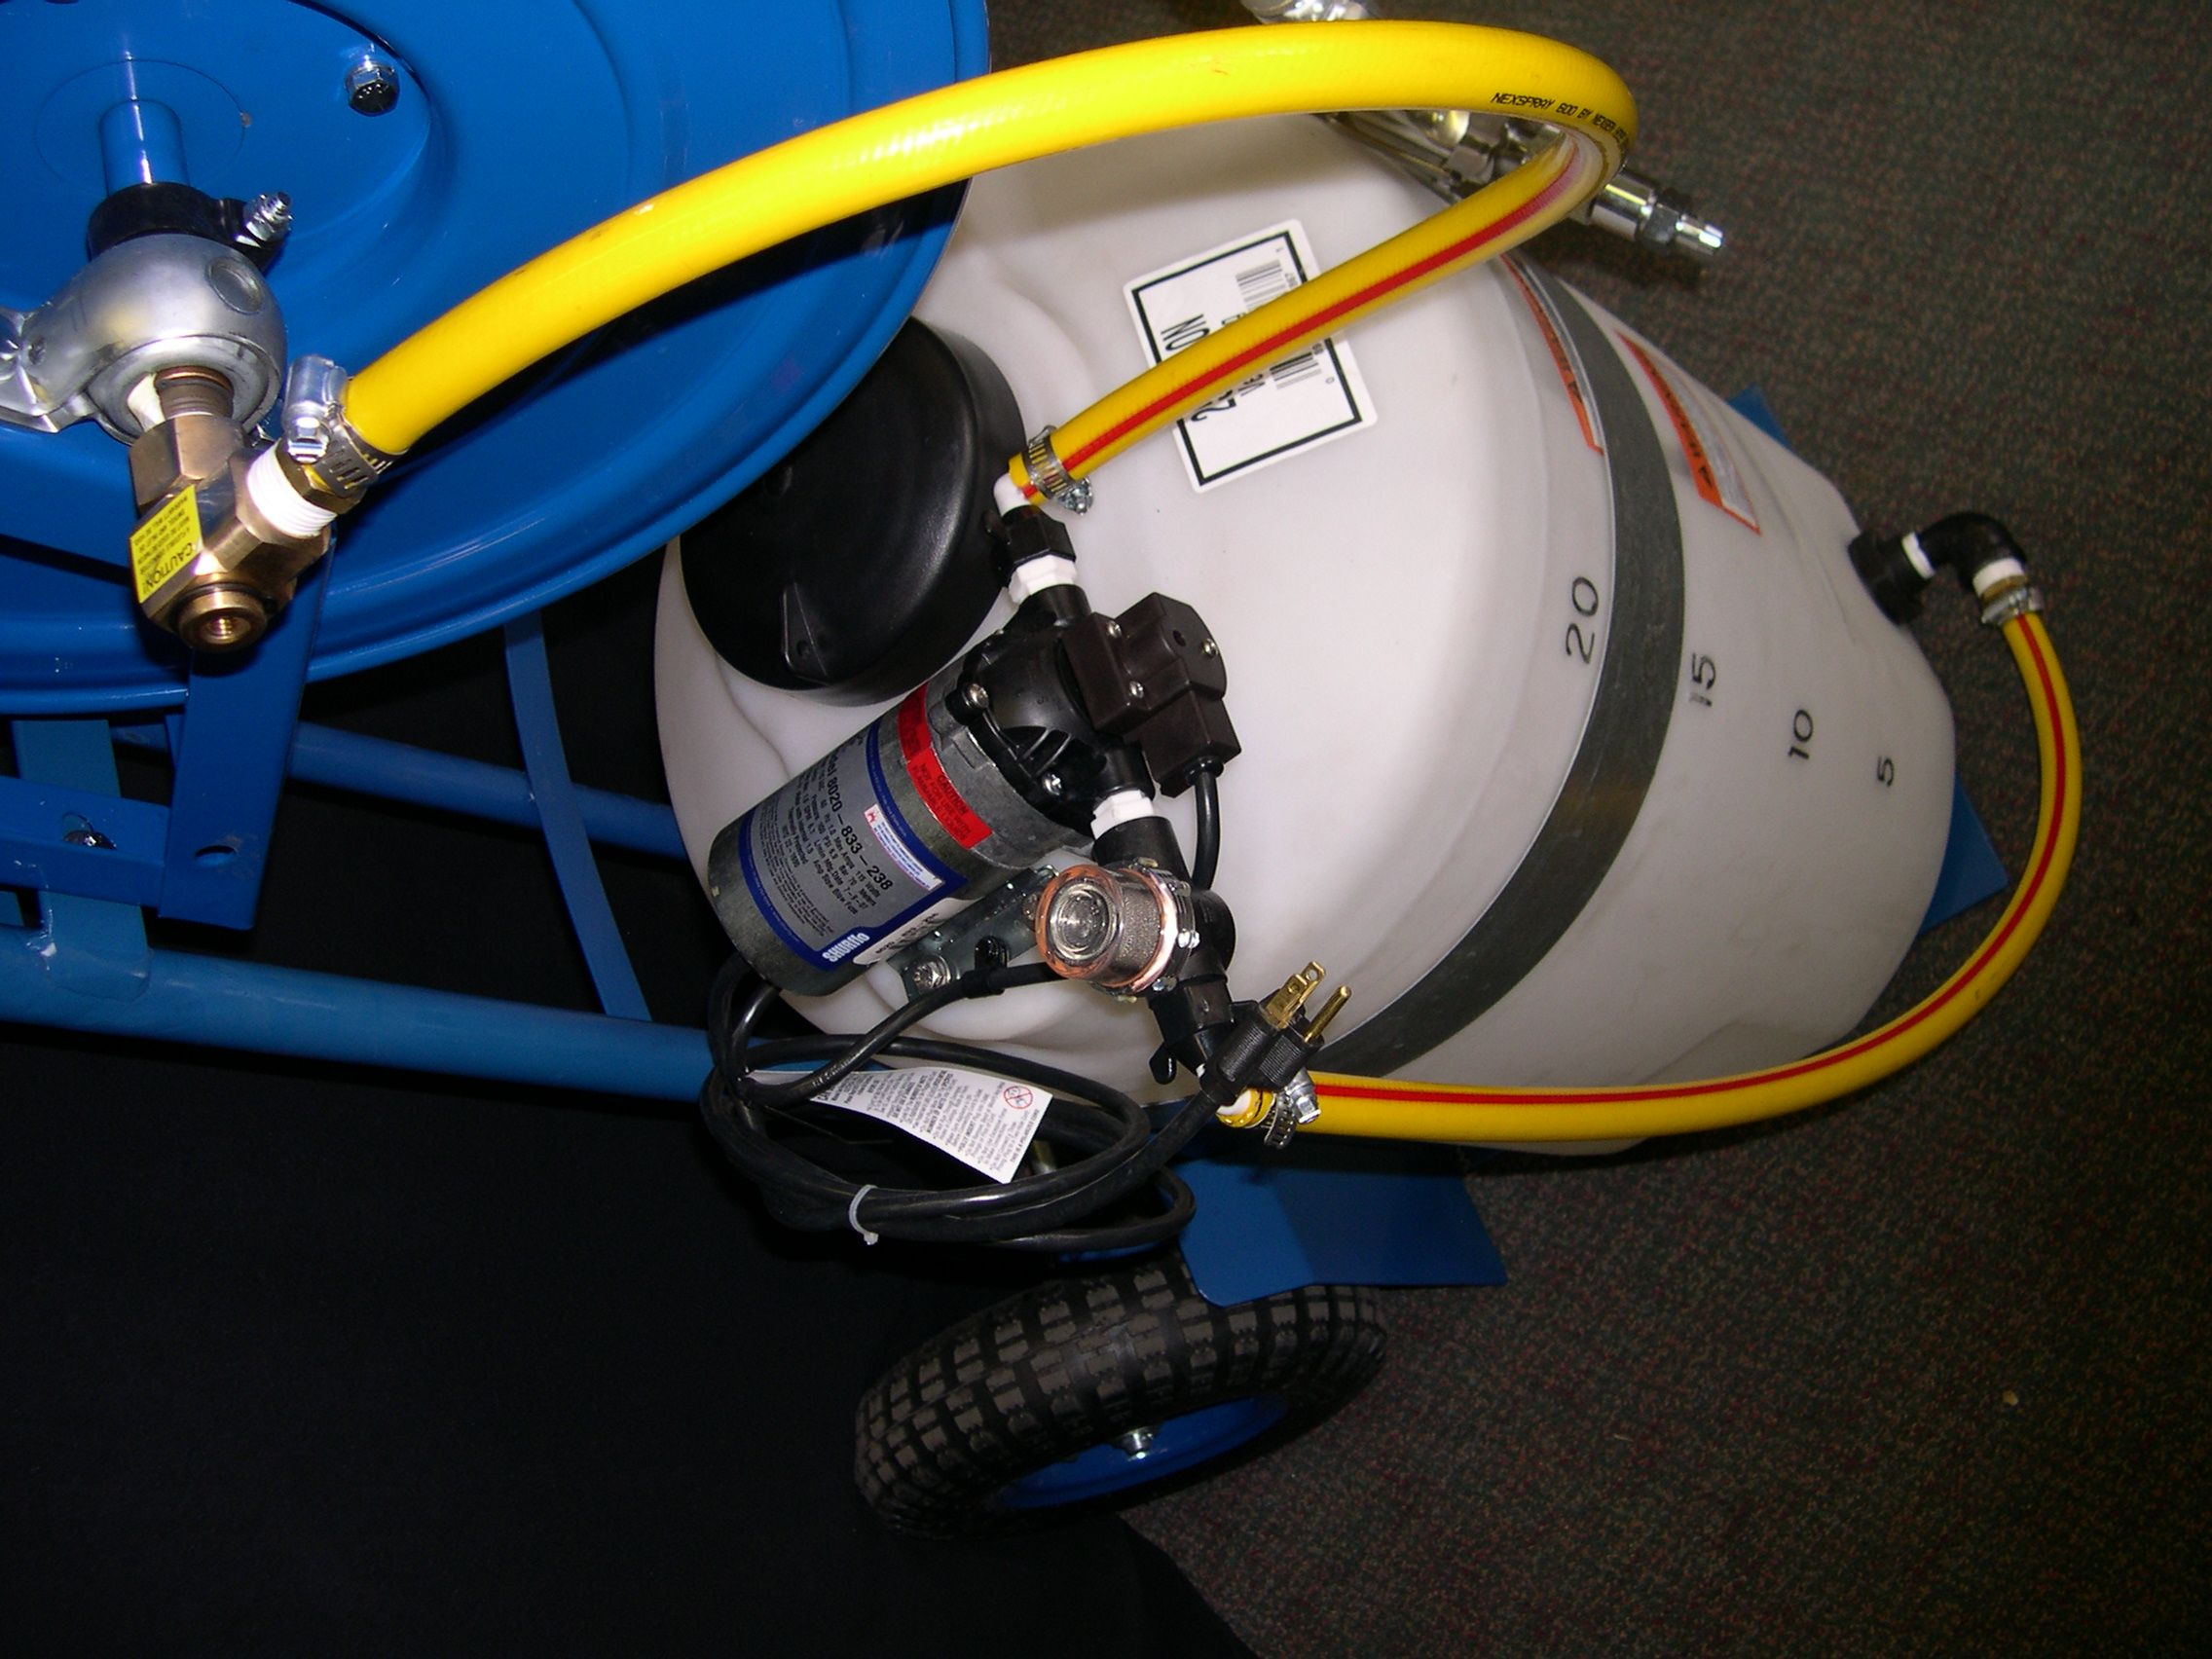 Shurflo pump and motor cox heavy duty hose reel heavy for 12 volt hose reel motor